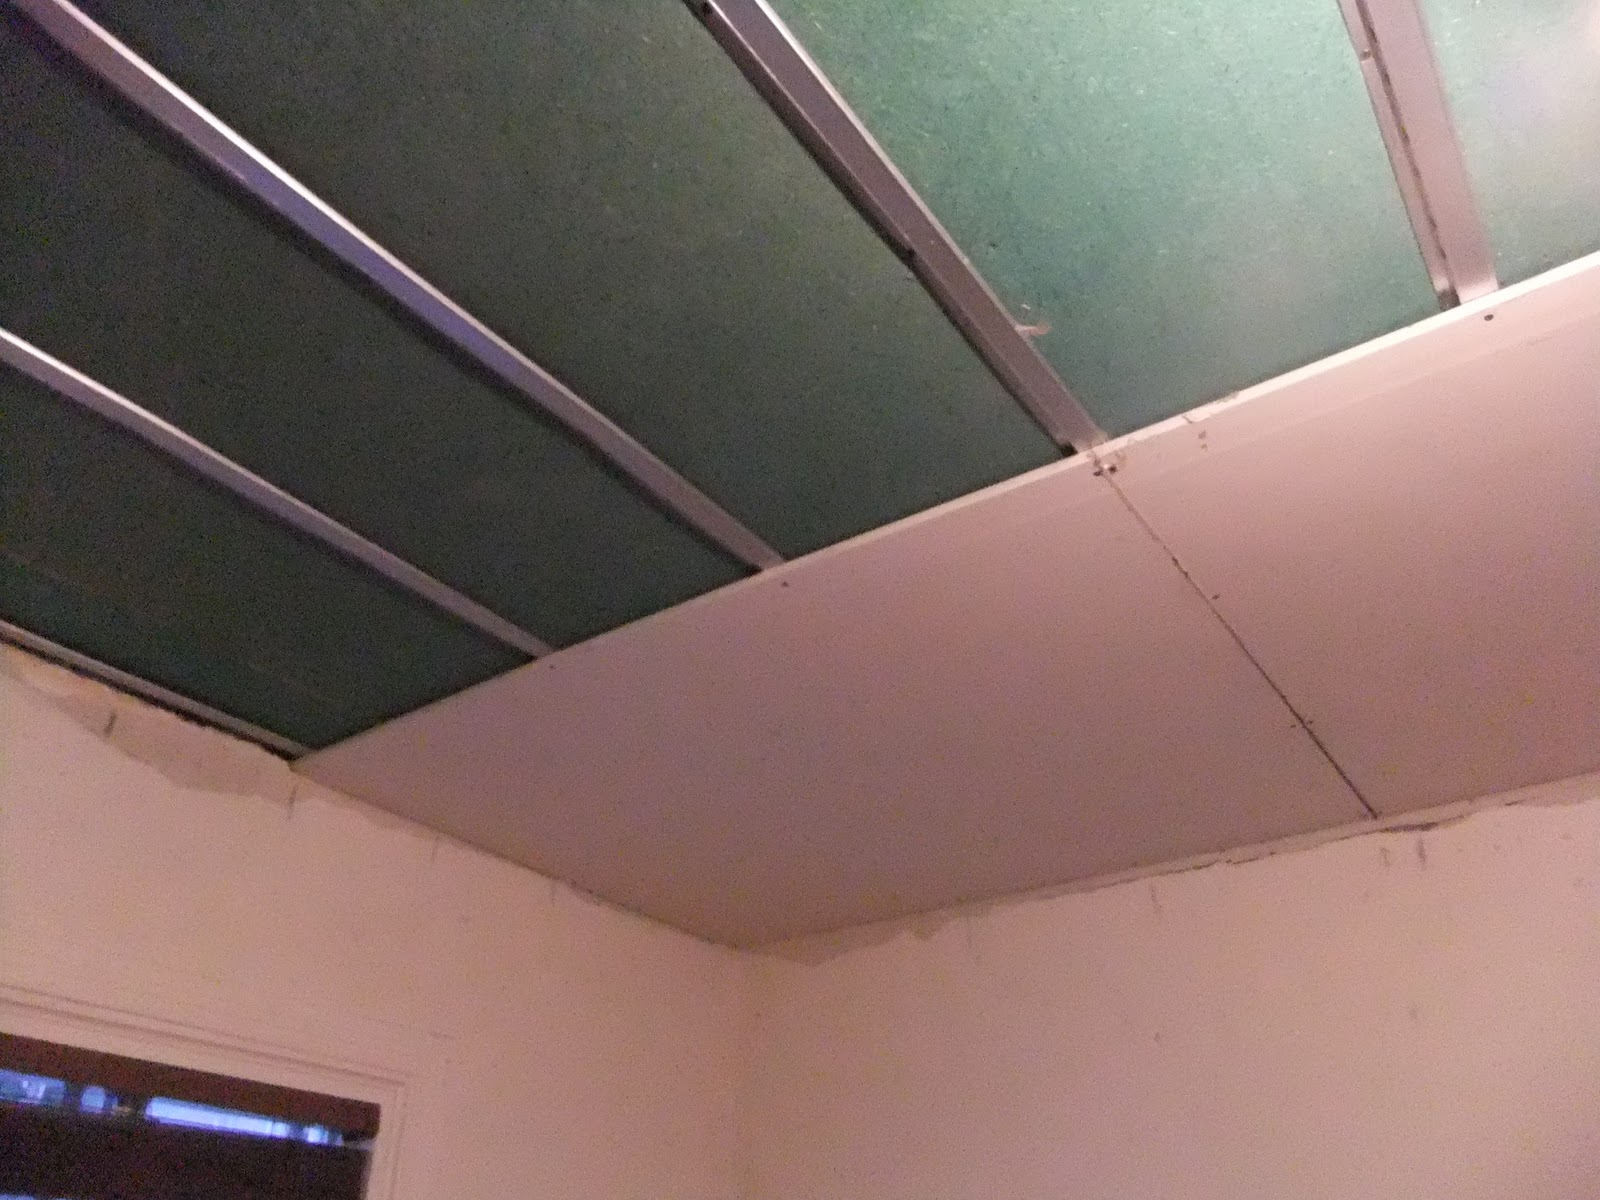 installer gypse plafond free programs utilities and apps workblogs. Black Bedroom Furniture Sets. Home Design Ideas